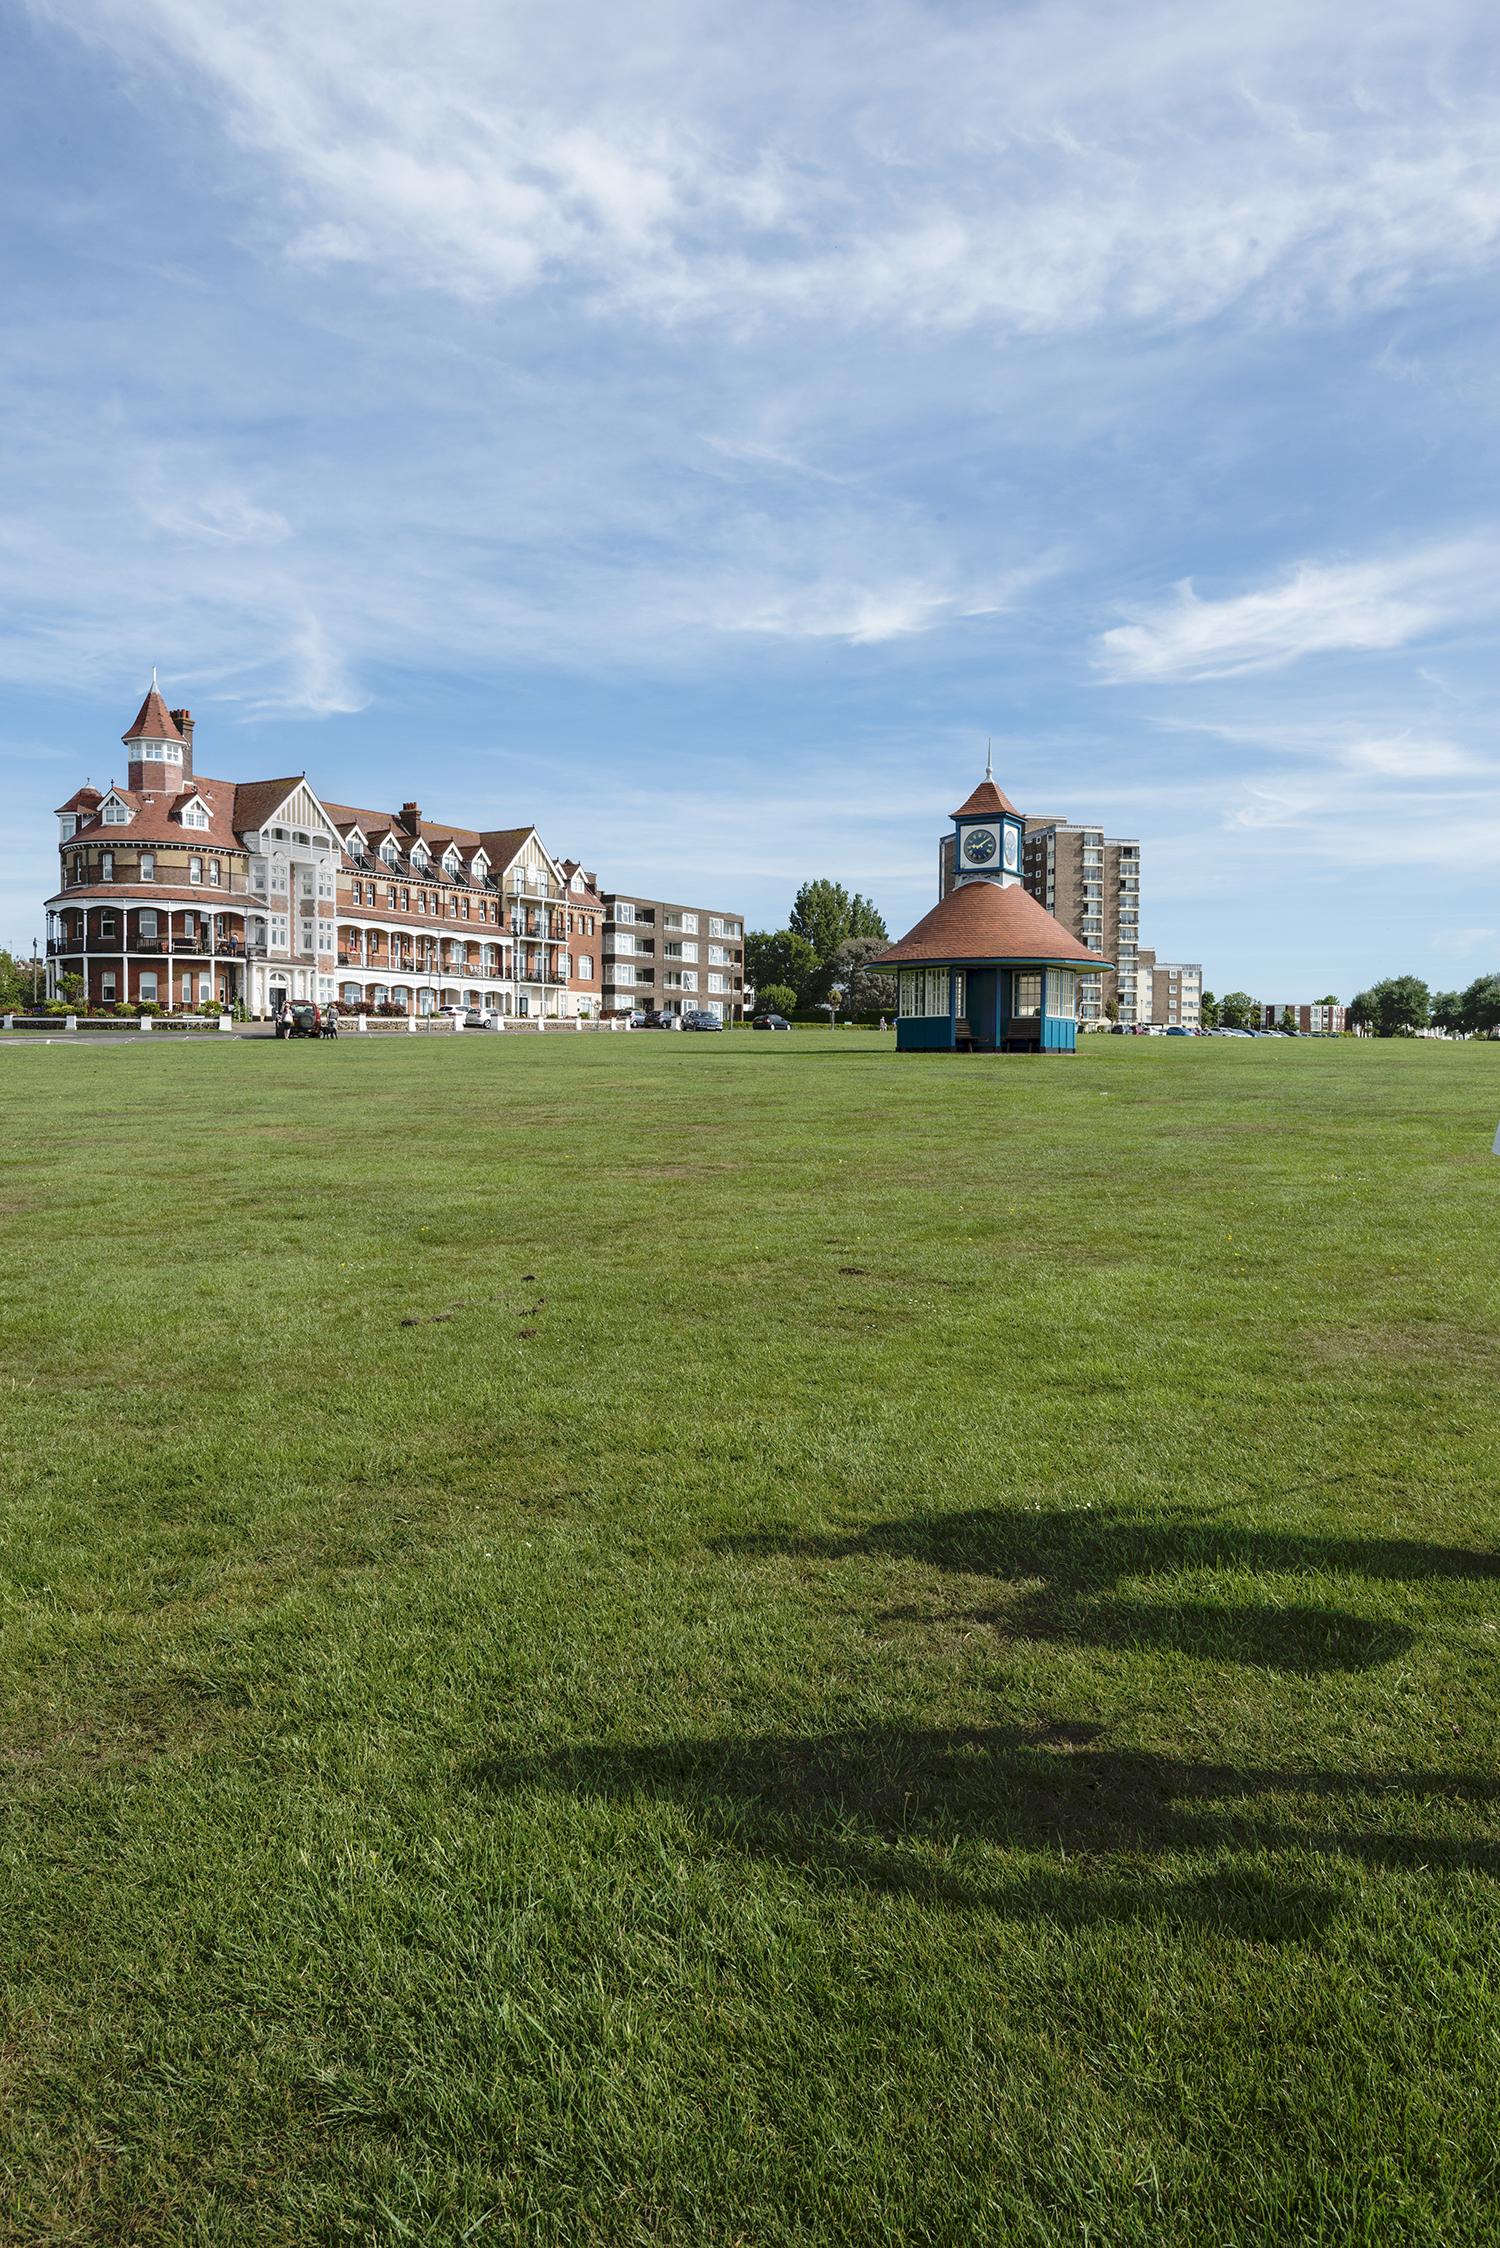 Frinton's Greensward